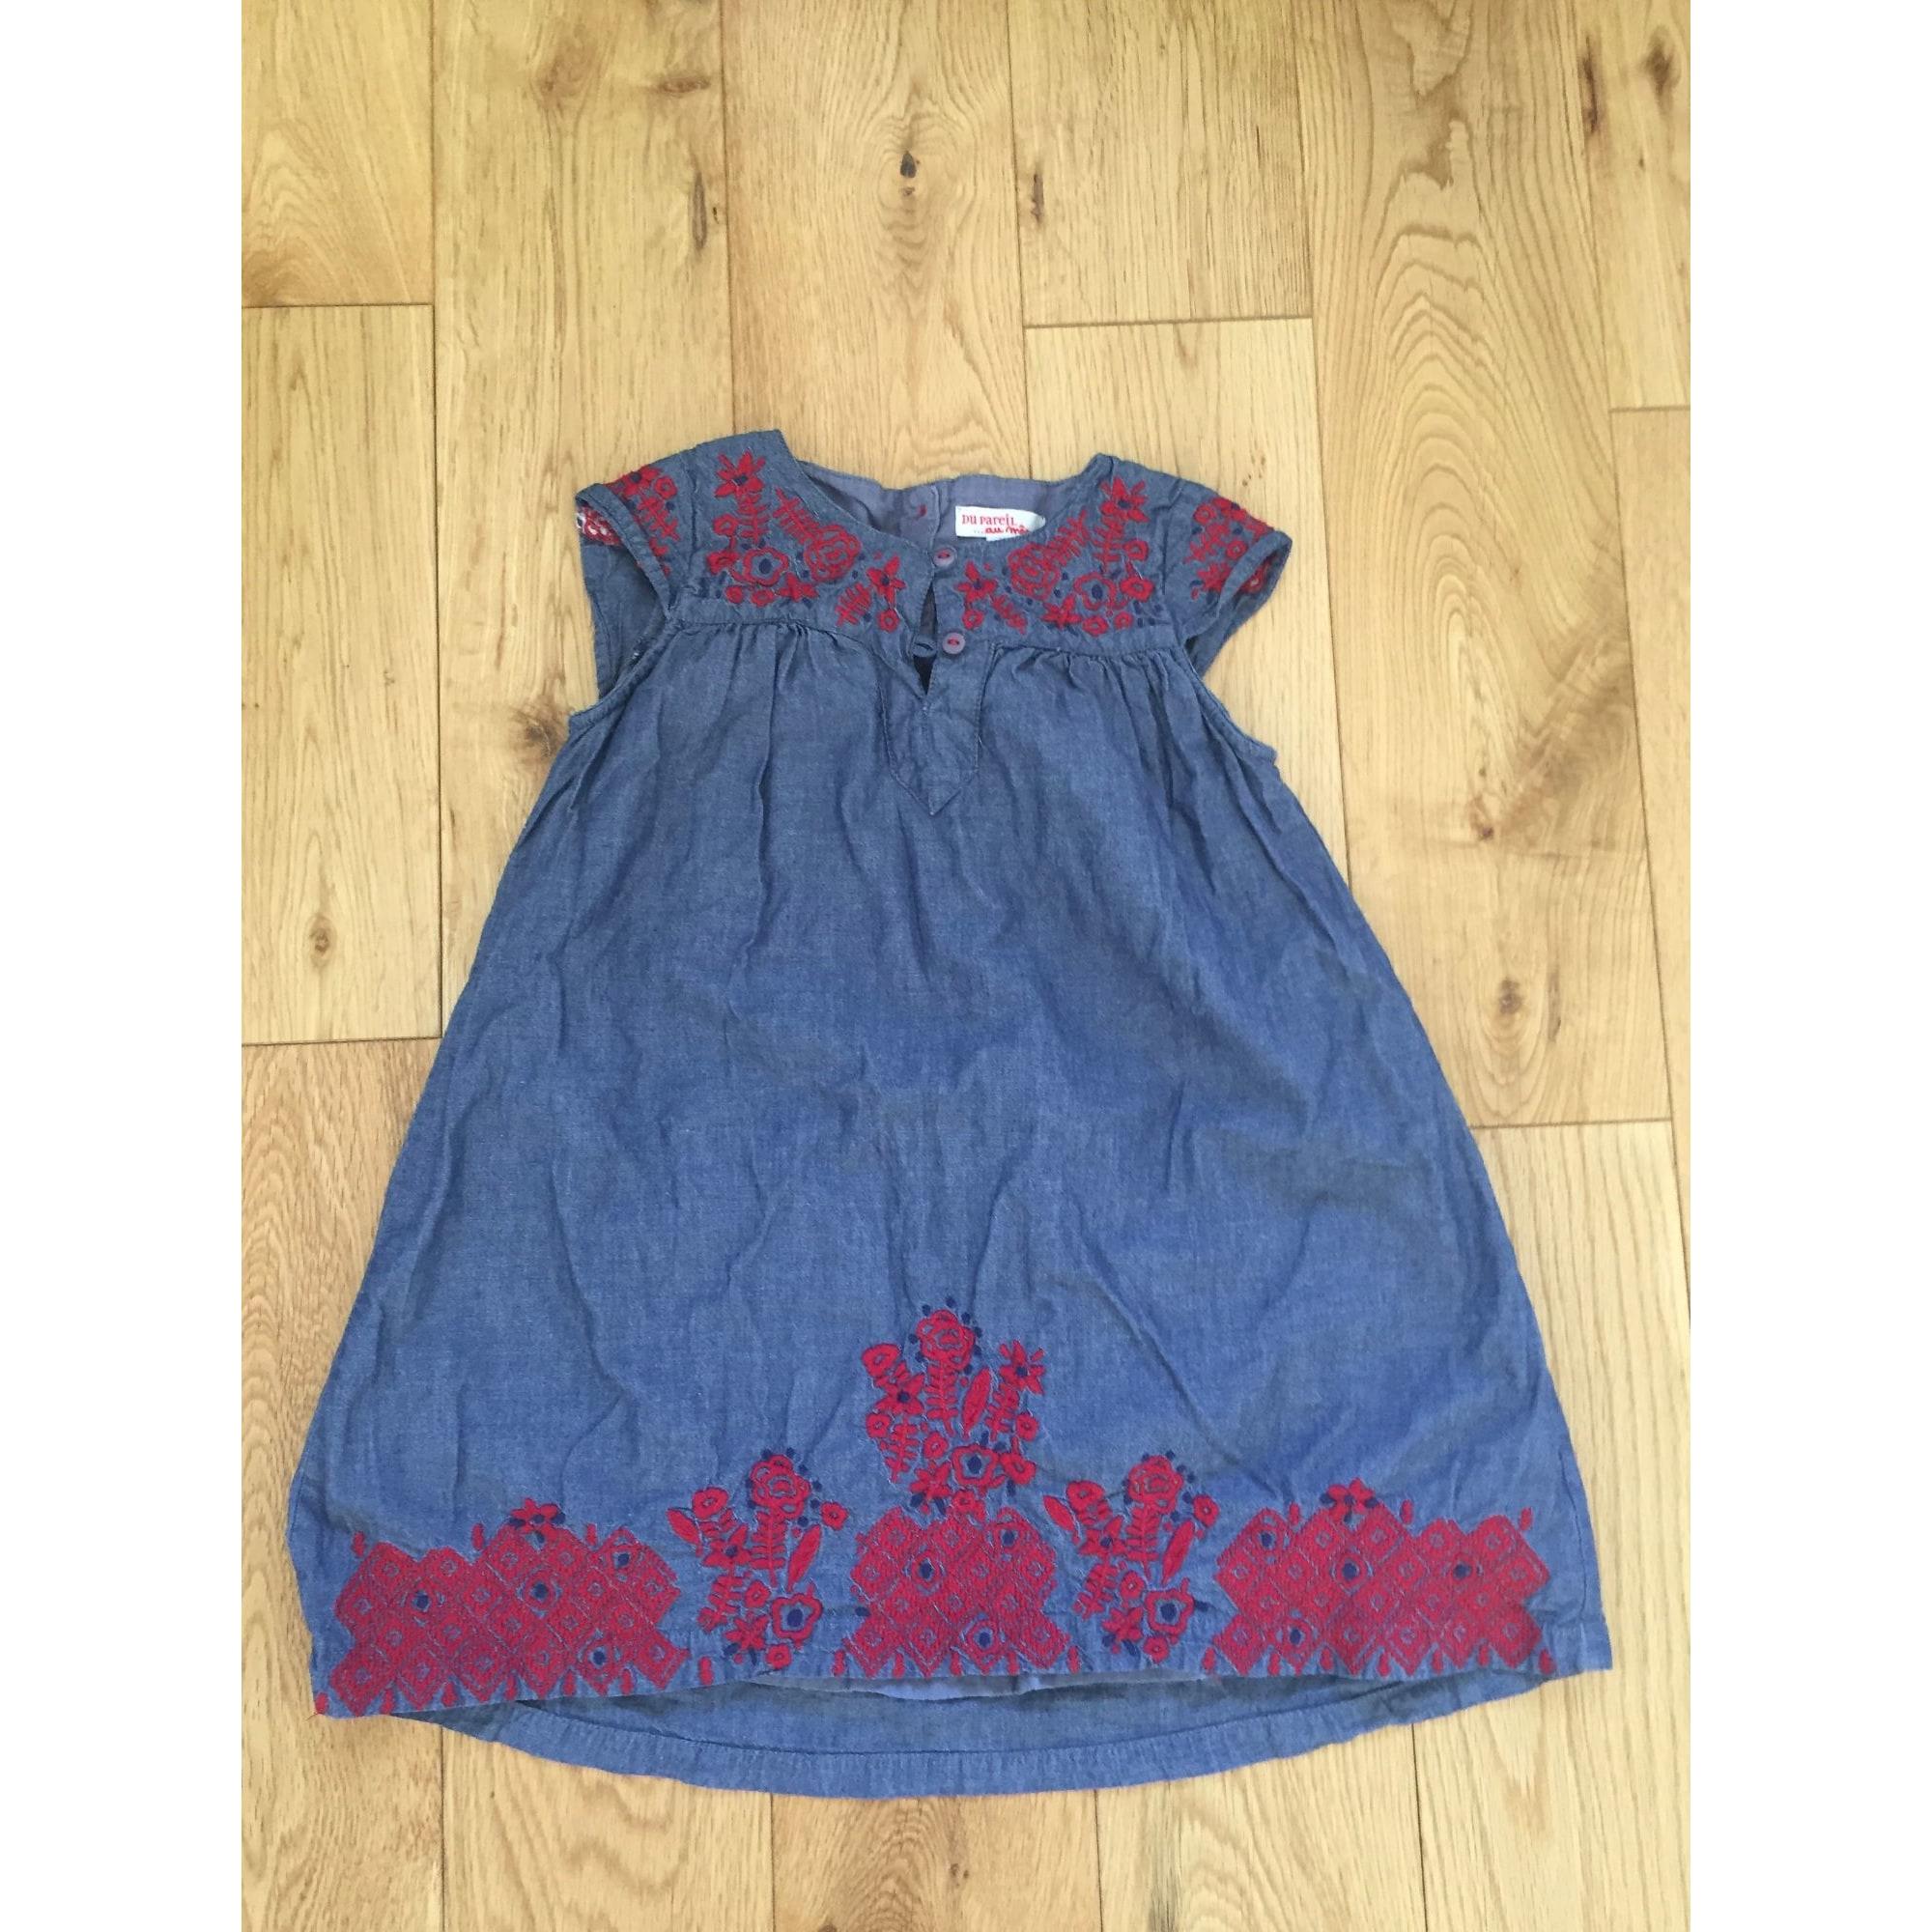 Robe DU PAREIL AU MÊME DPAM Bleu, bleu marine, bleu turquoise